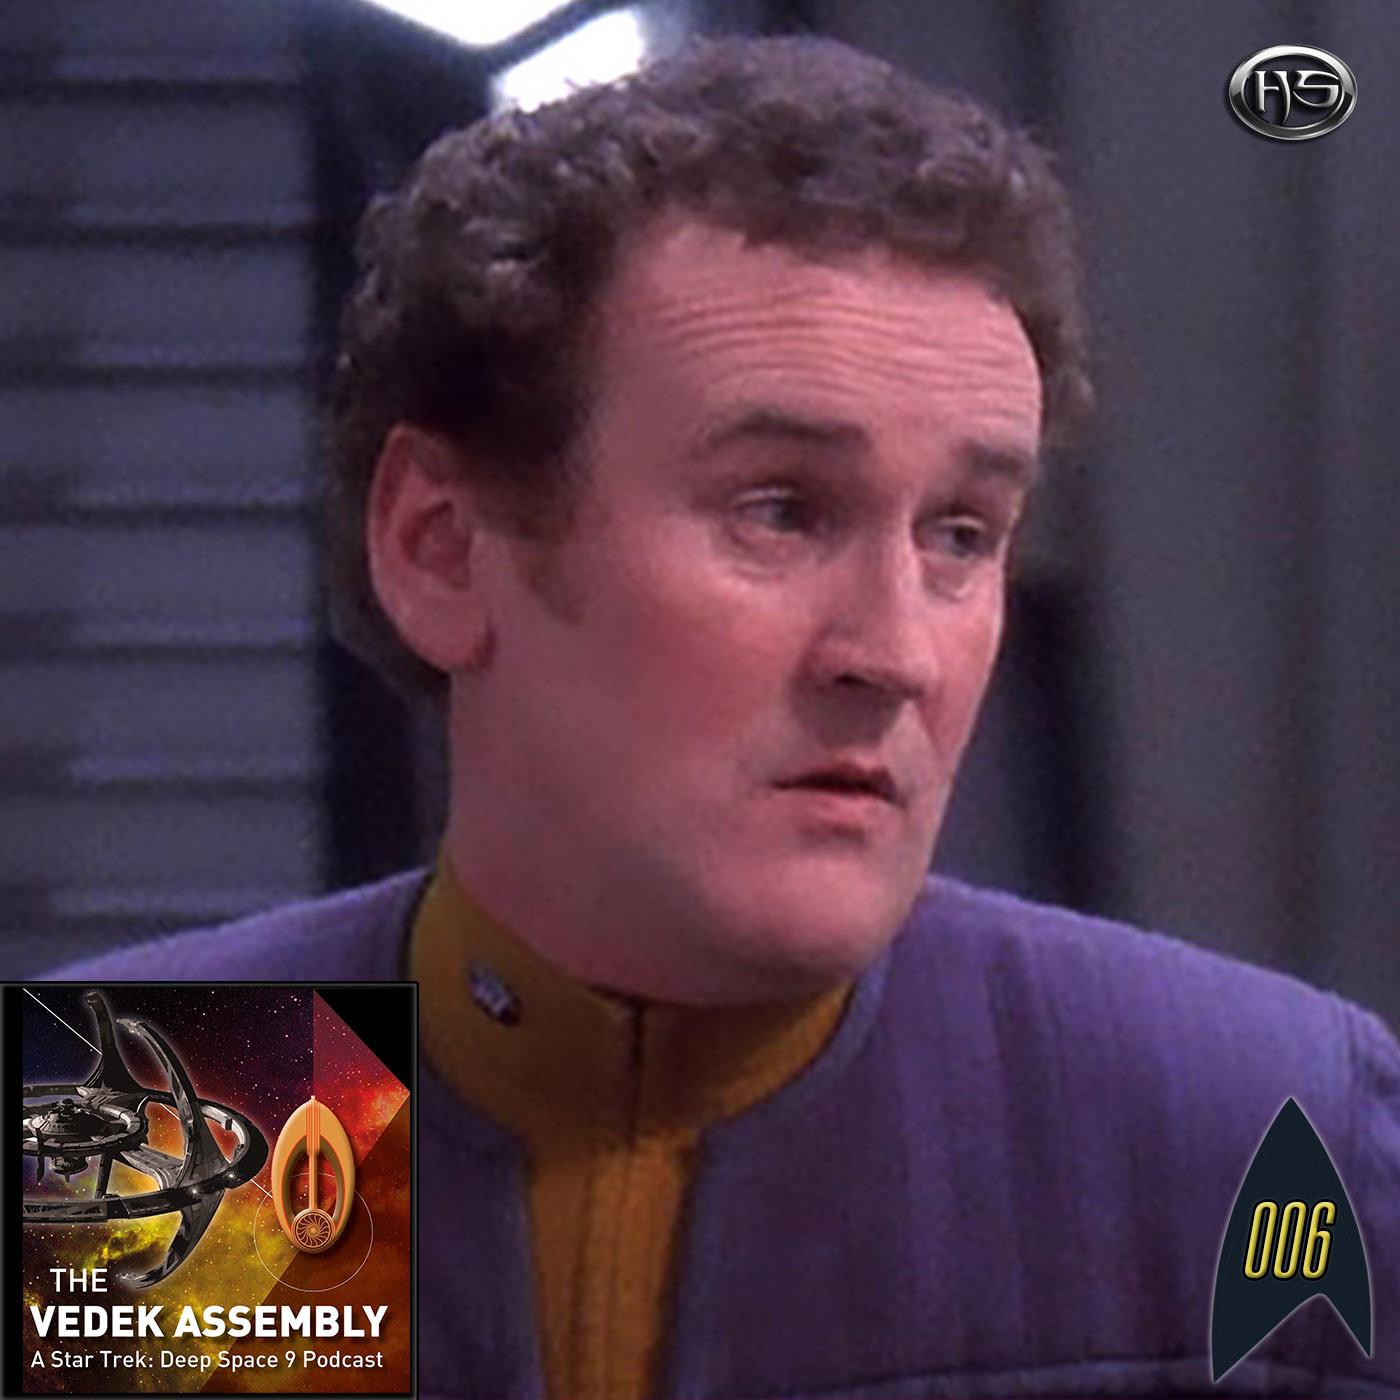 The Vedek Assembly Episode 6